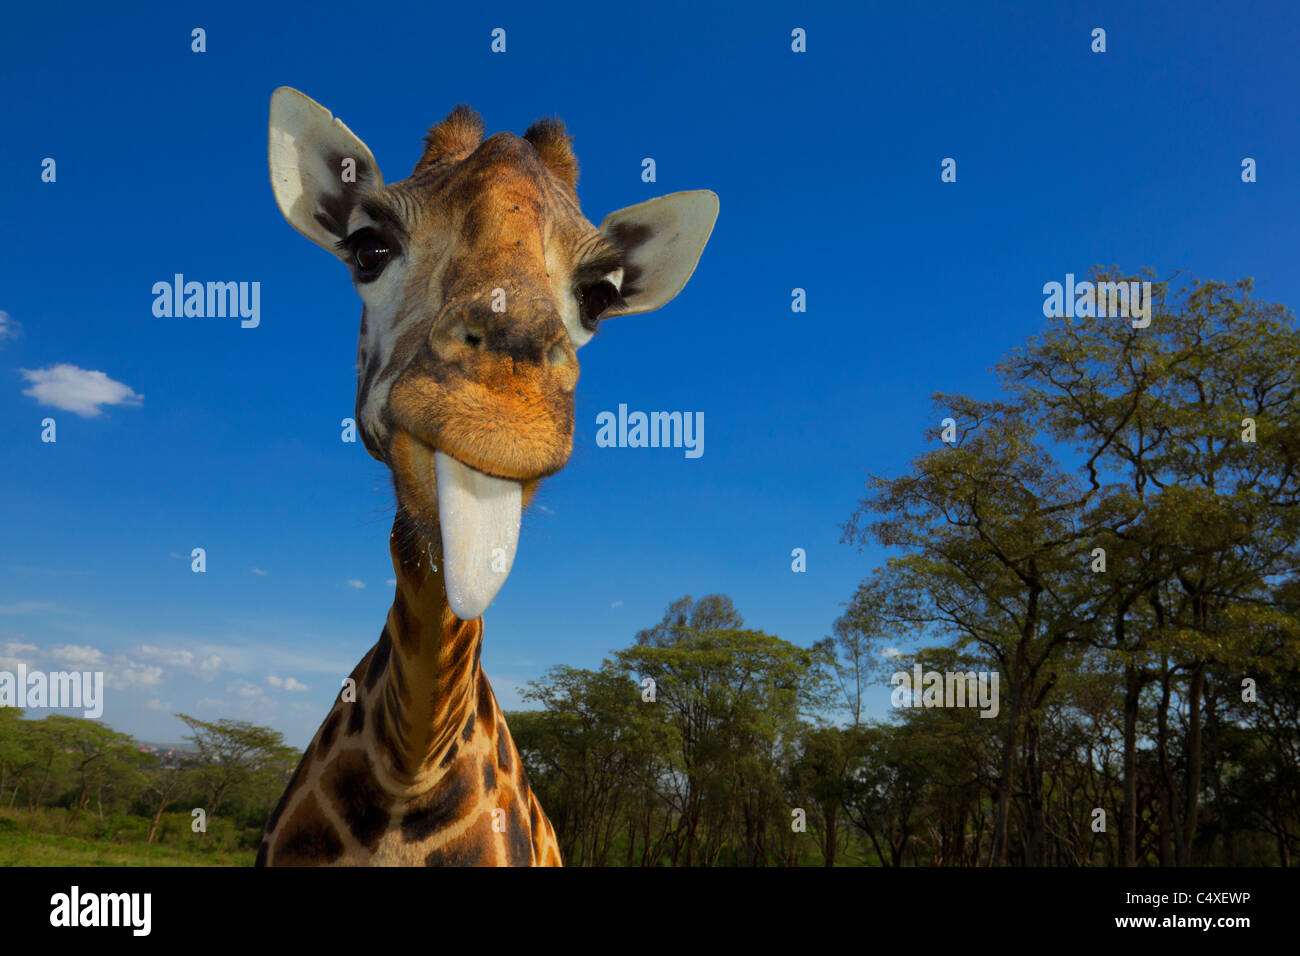 Girafas Rothschild (Giraffa camelopardalis rothschildi) es una de las 9 subespecies de jirafas.Giraffe Manor Kenia. Imagen De Stock